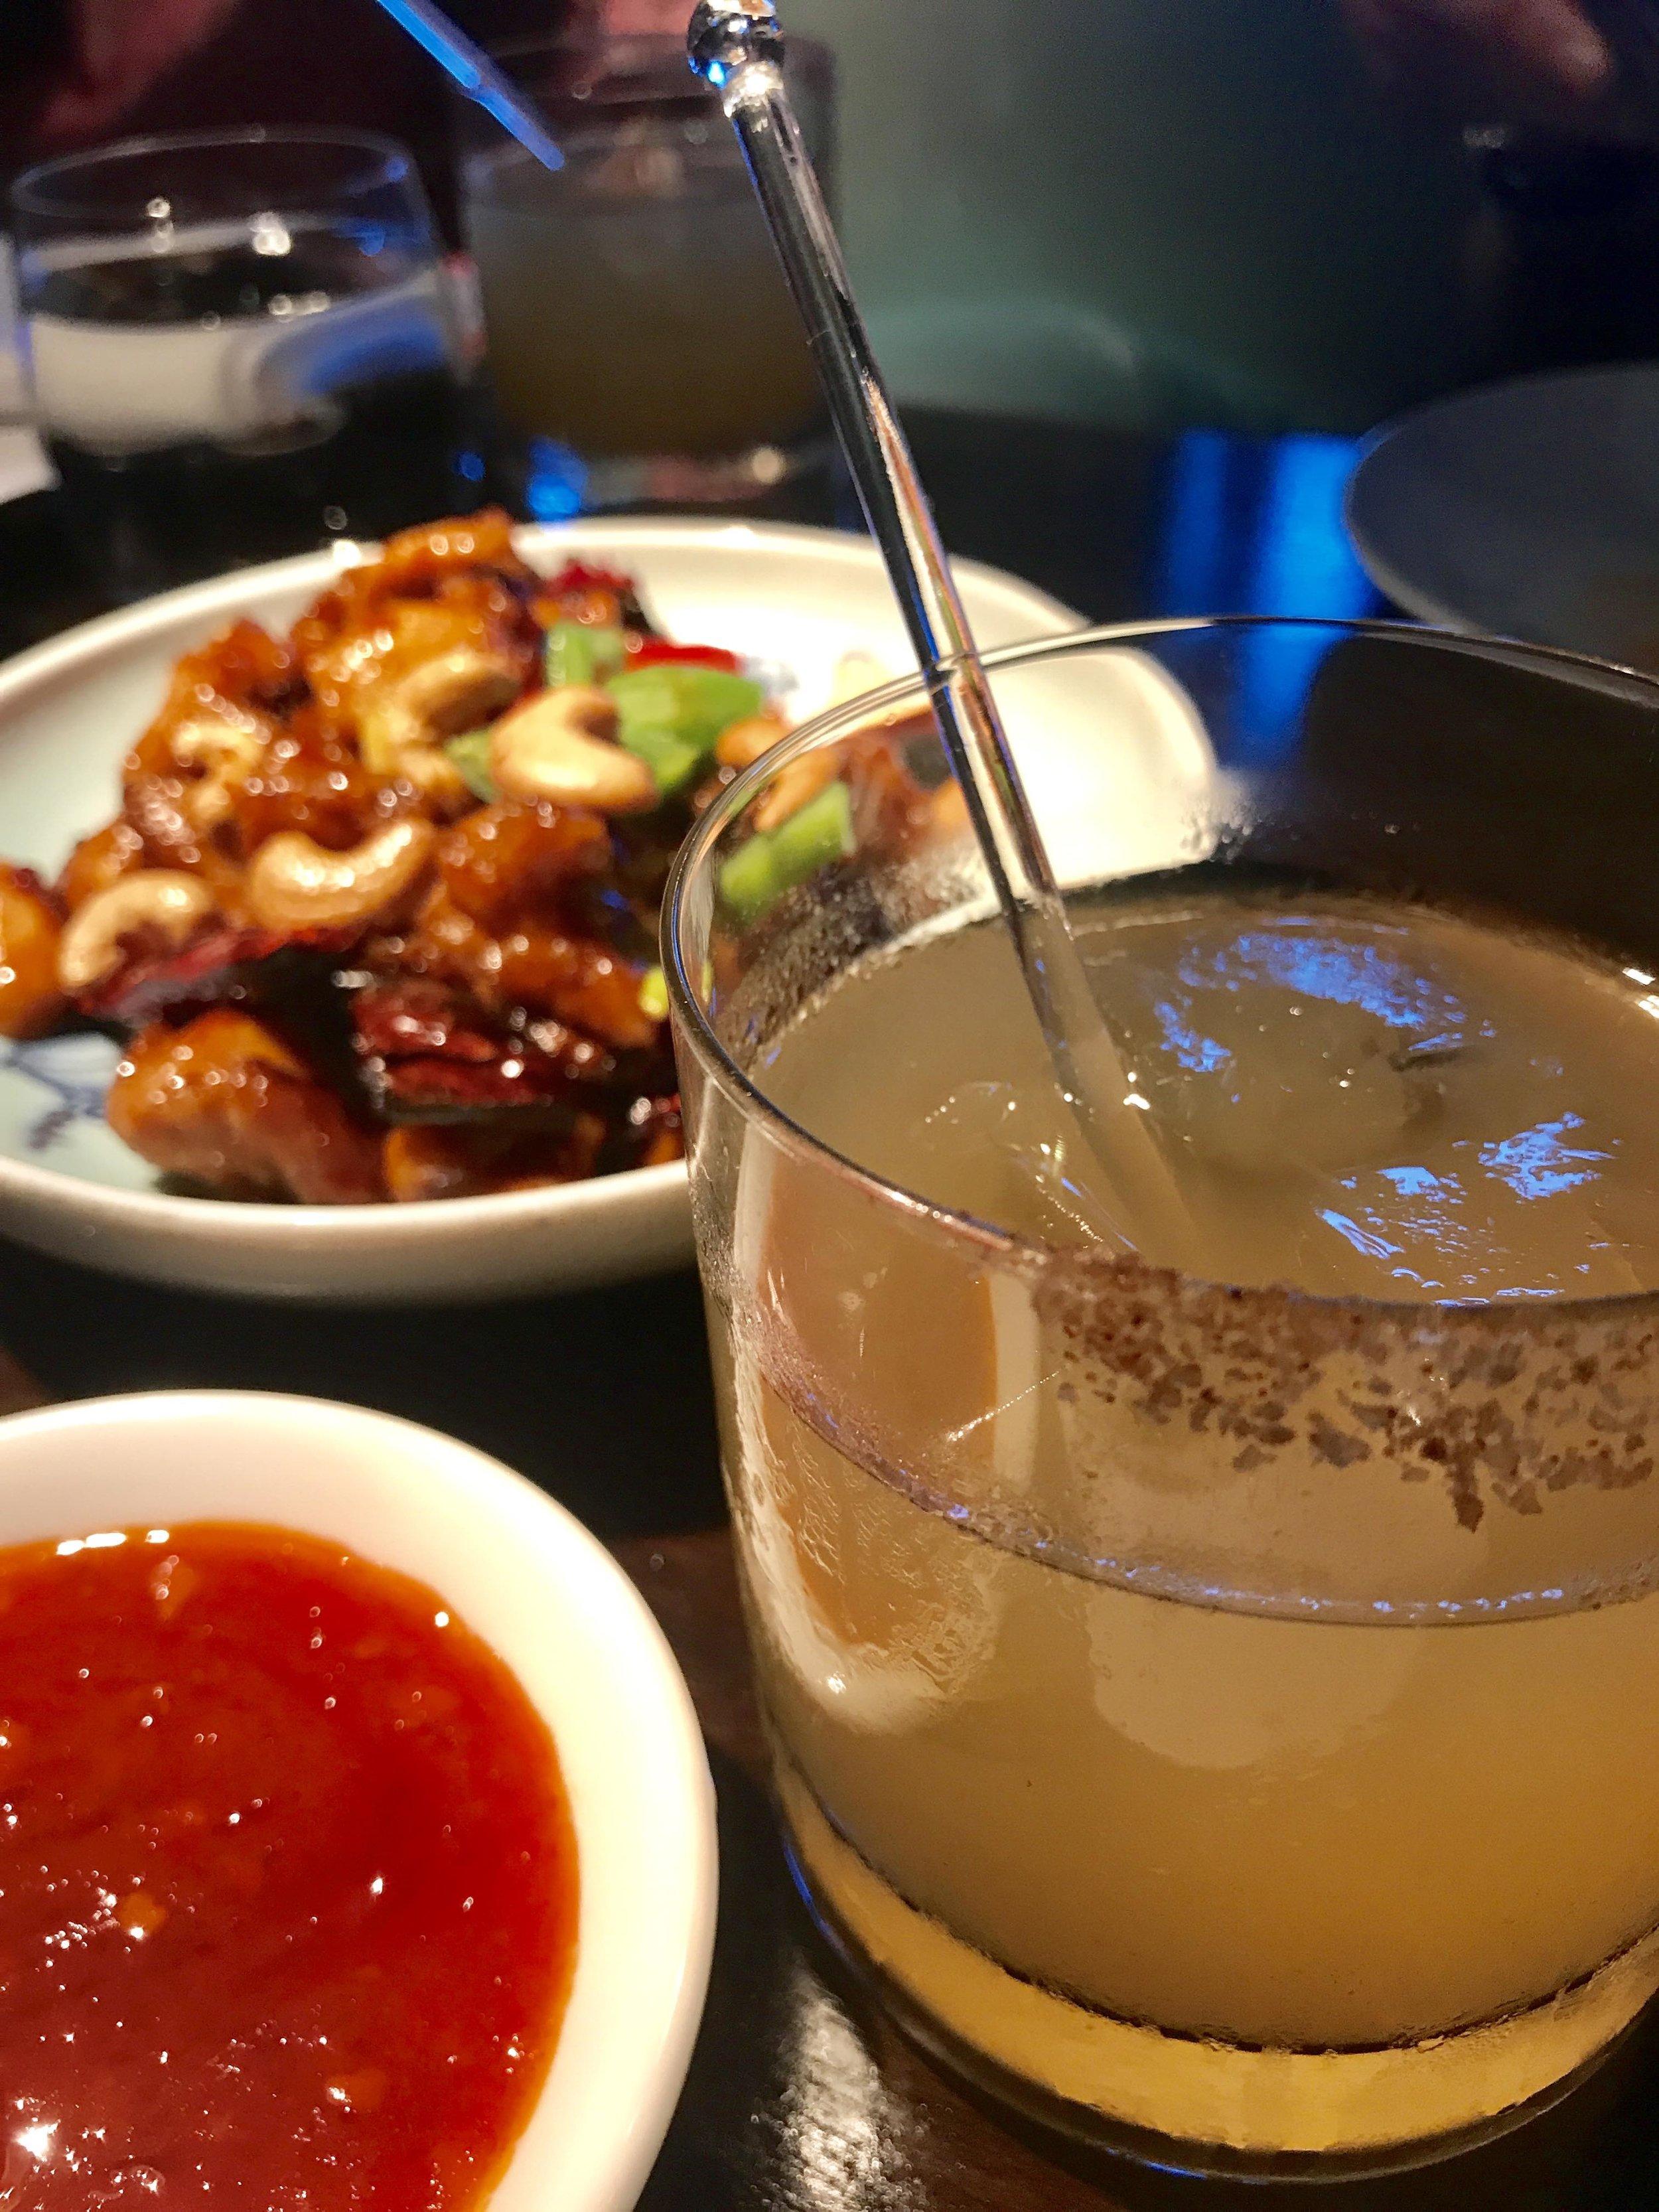 Hakkasan Miami Spice Diced Chicken with Chilis